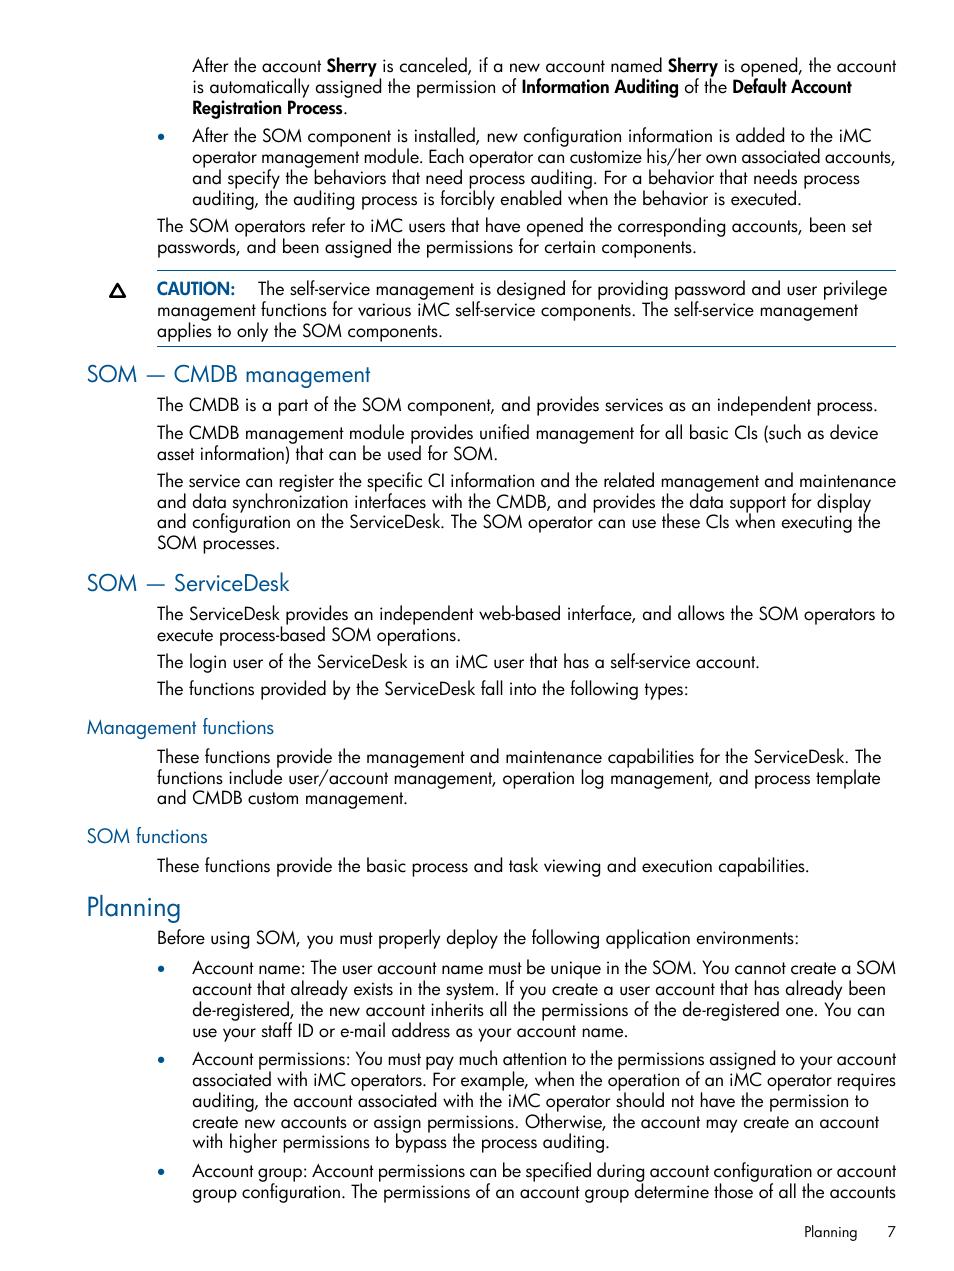 Som — cmdb management, Som — servicedesk, Management